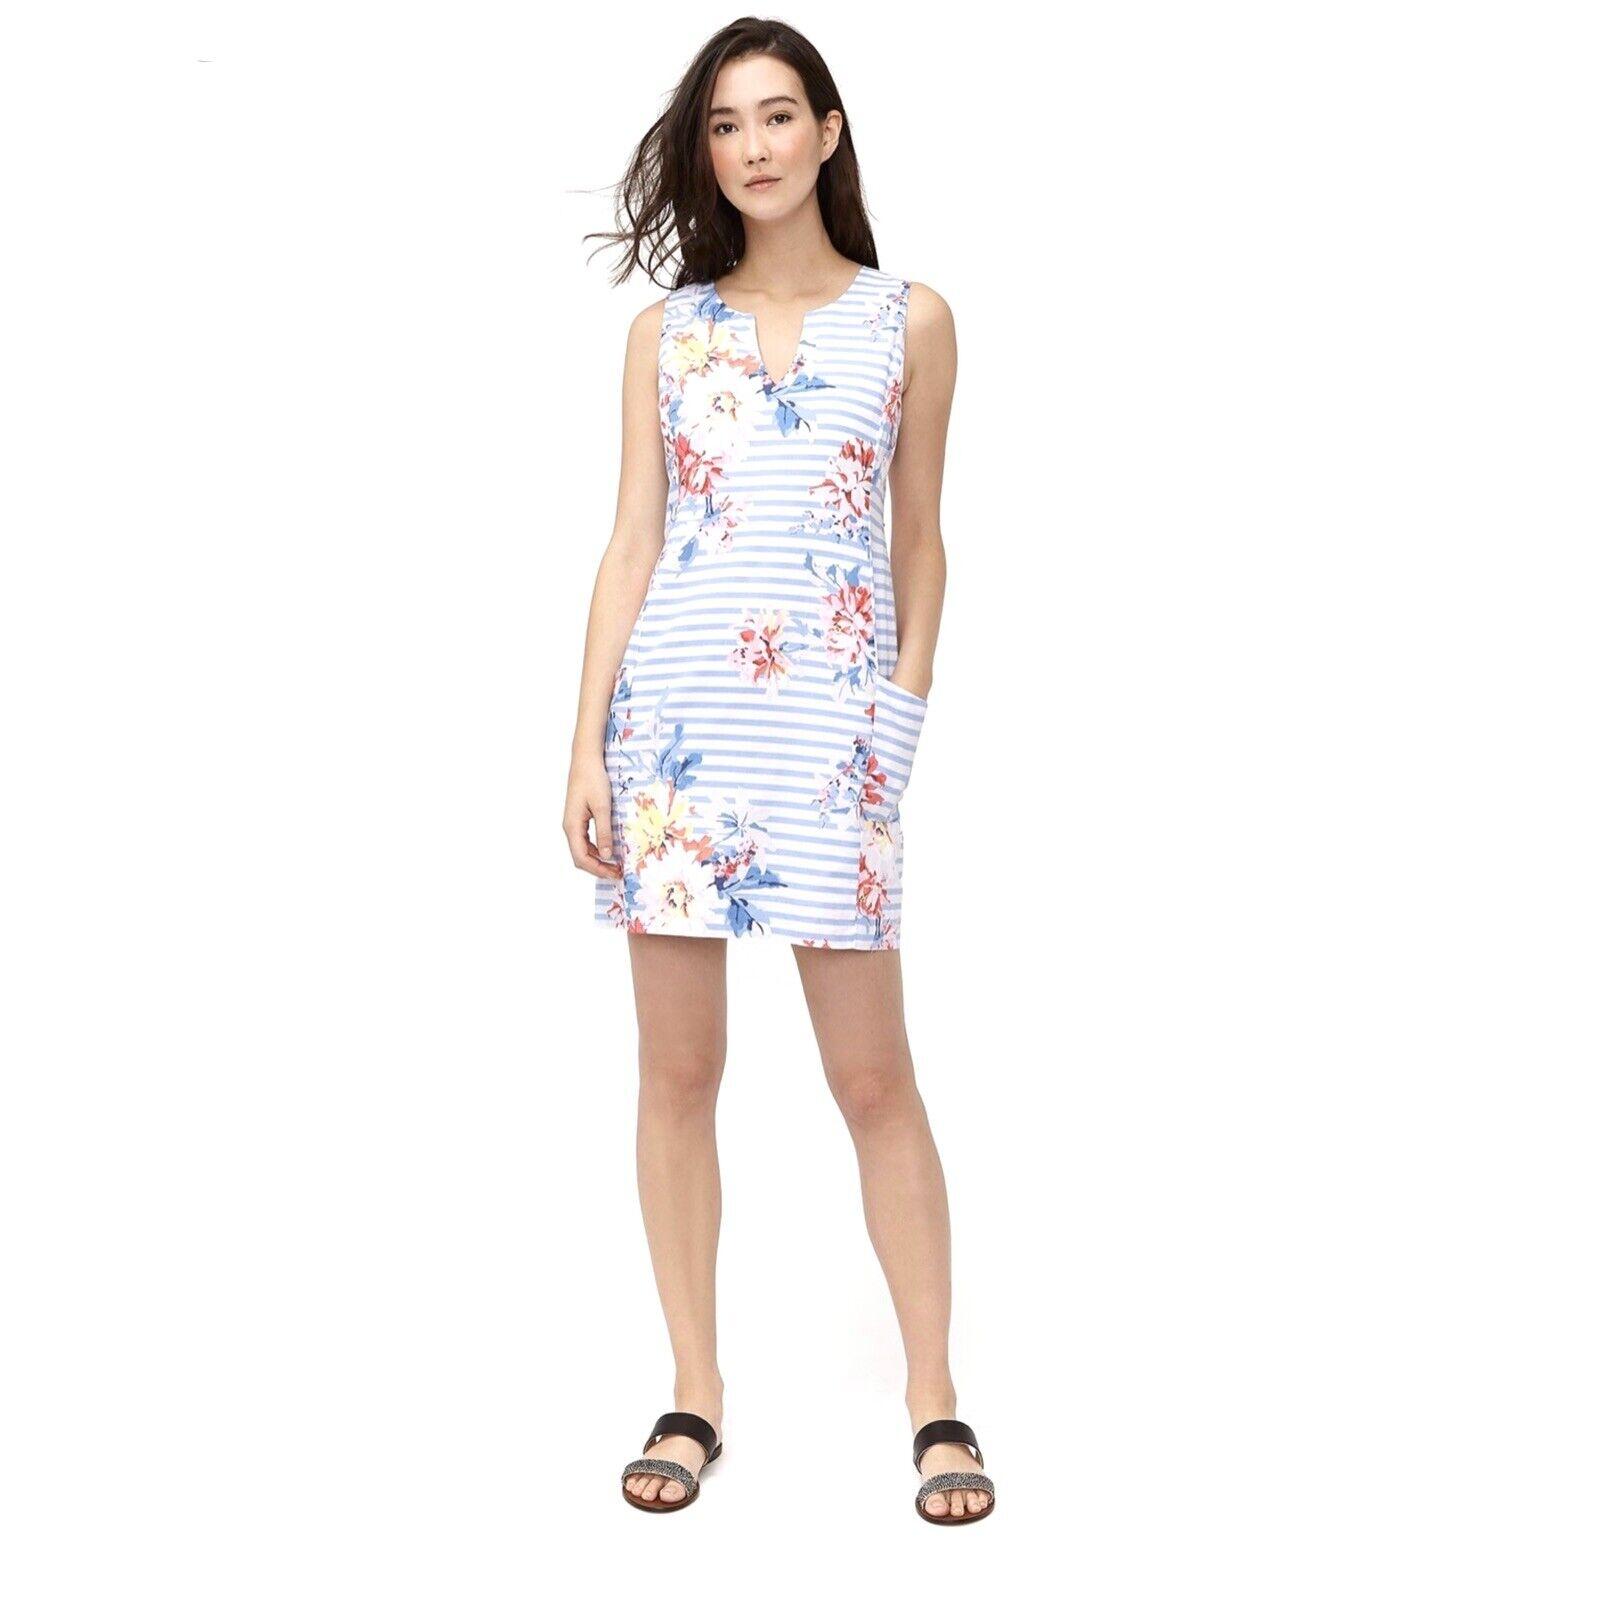 Joules Elayna Striped Floral Sleeveless Shift Dress sz 16 Blue White Pink Linen